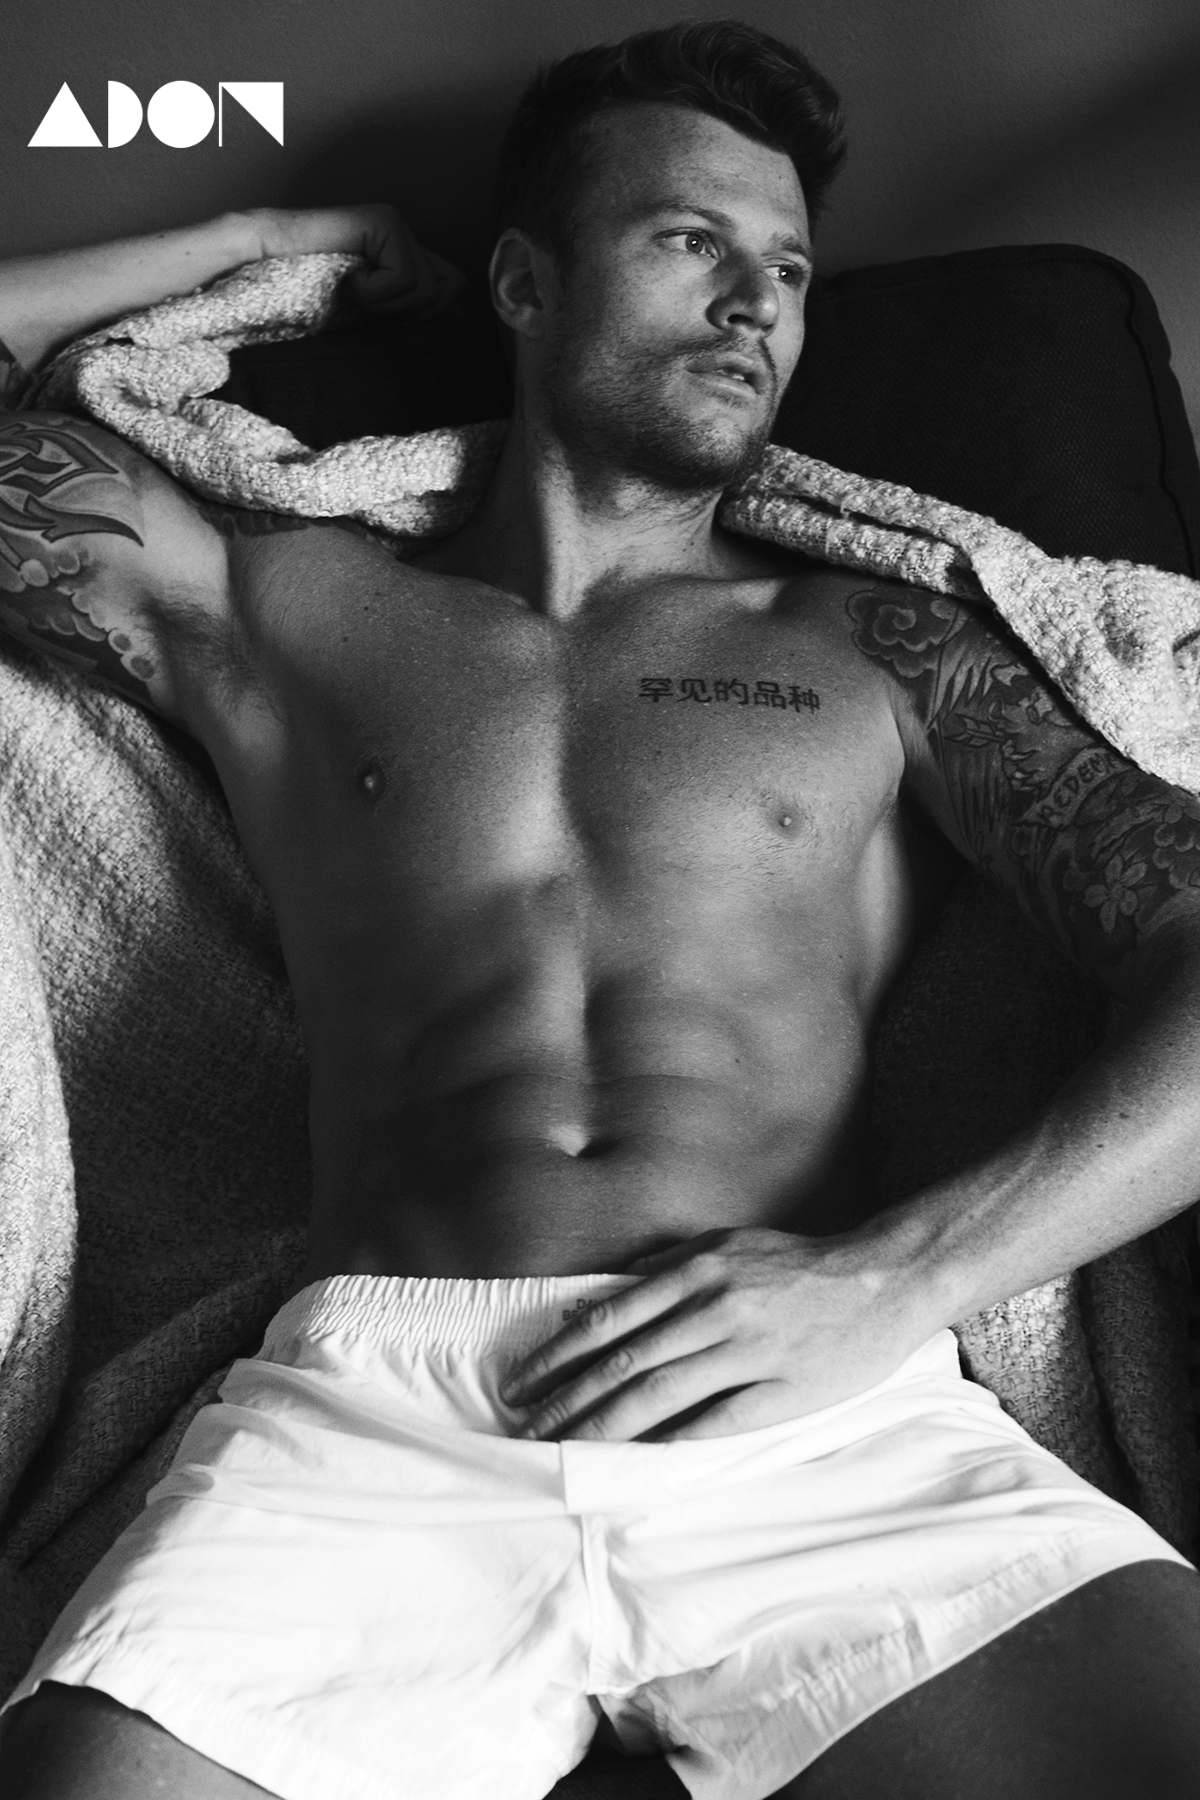 Adon Exclusive: Model Mike Mains By Patrick Lacsina